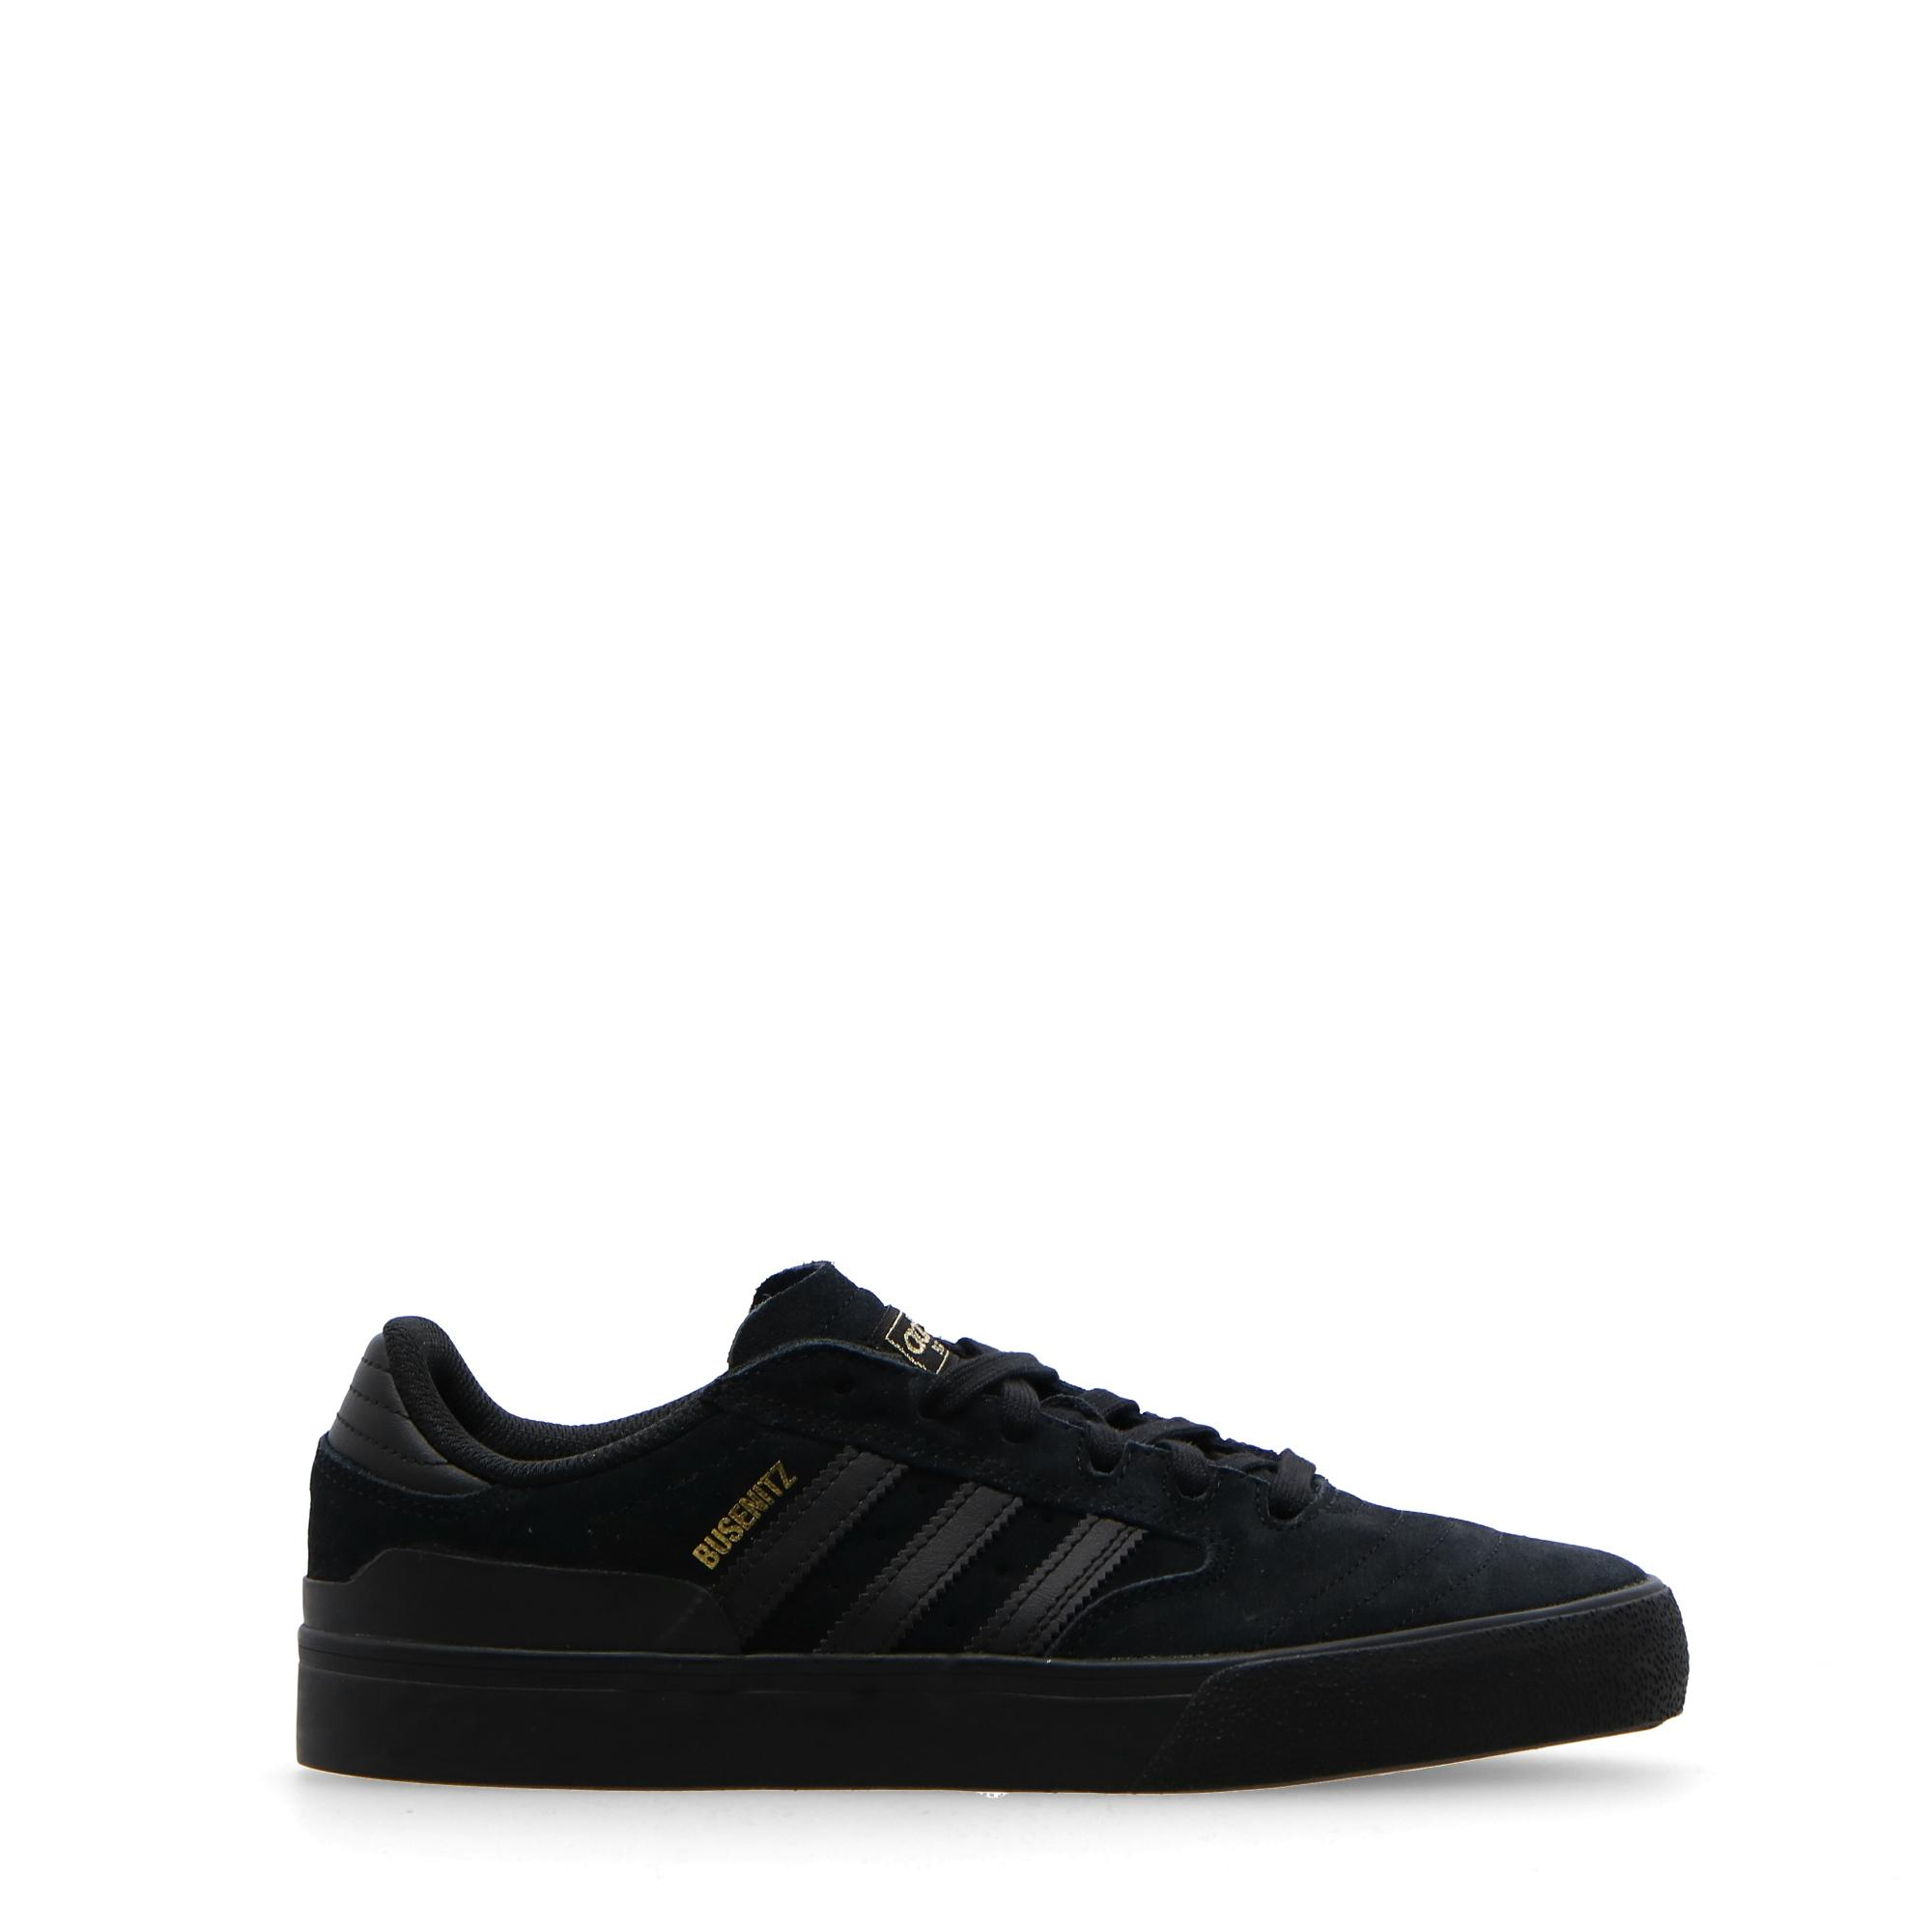 Adidas Busenitz Vulc Ii Core black gum4